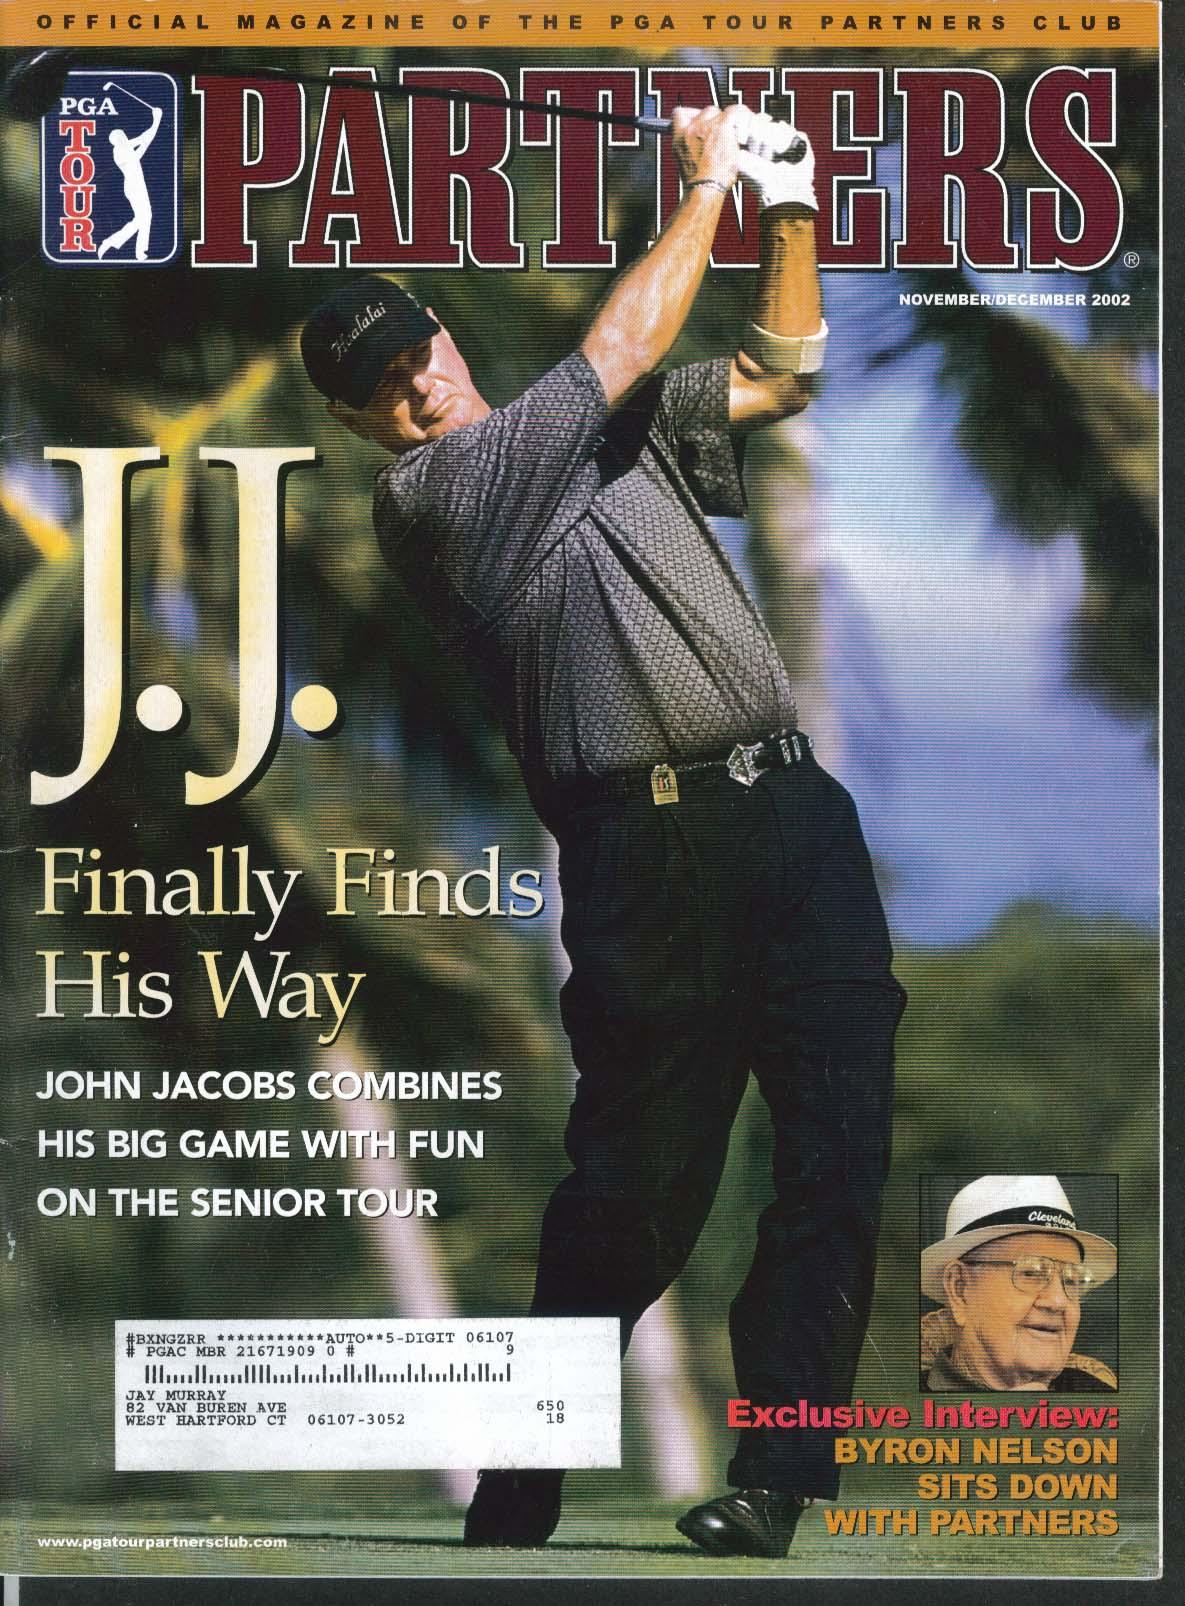 PGA TOUR PARTNERS John Jacobs Byron Nelson Chris DiMarco 11-12 2002